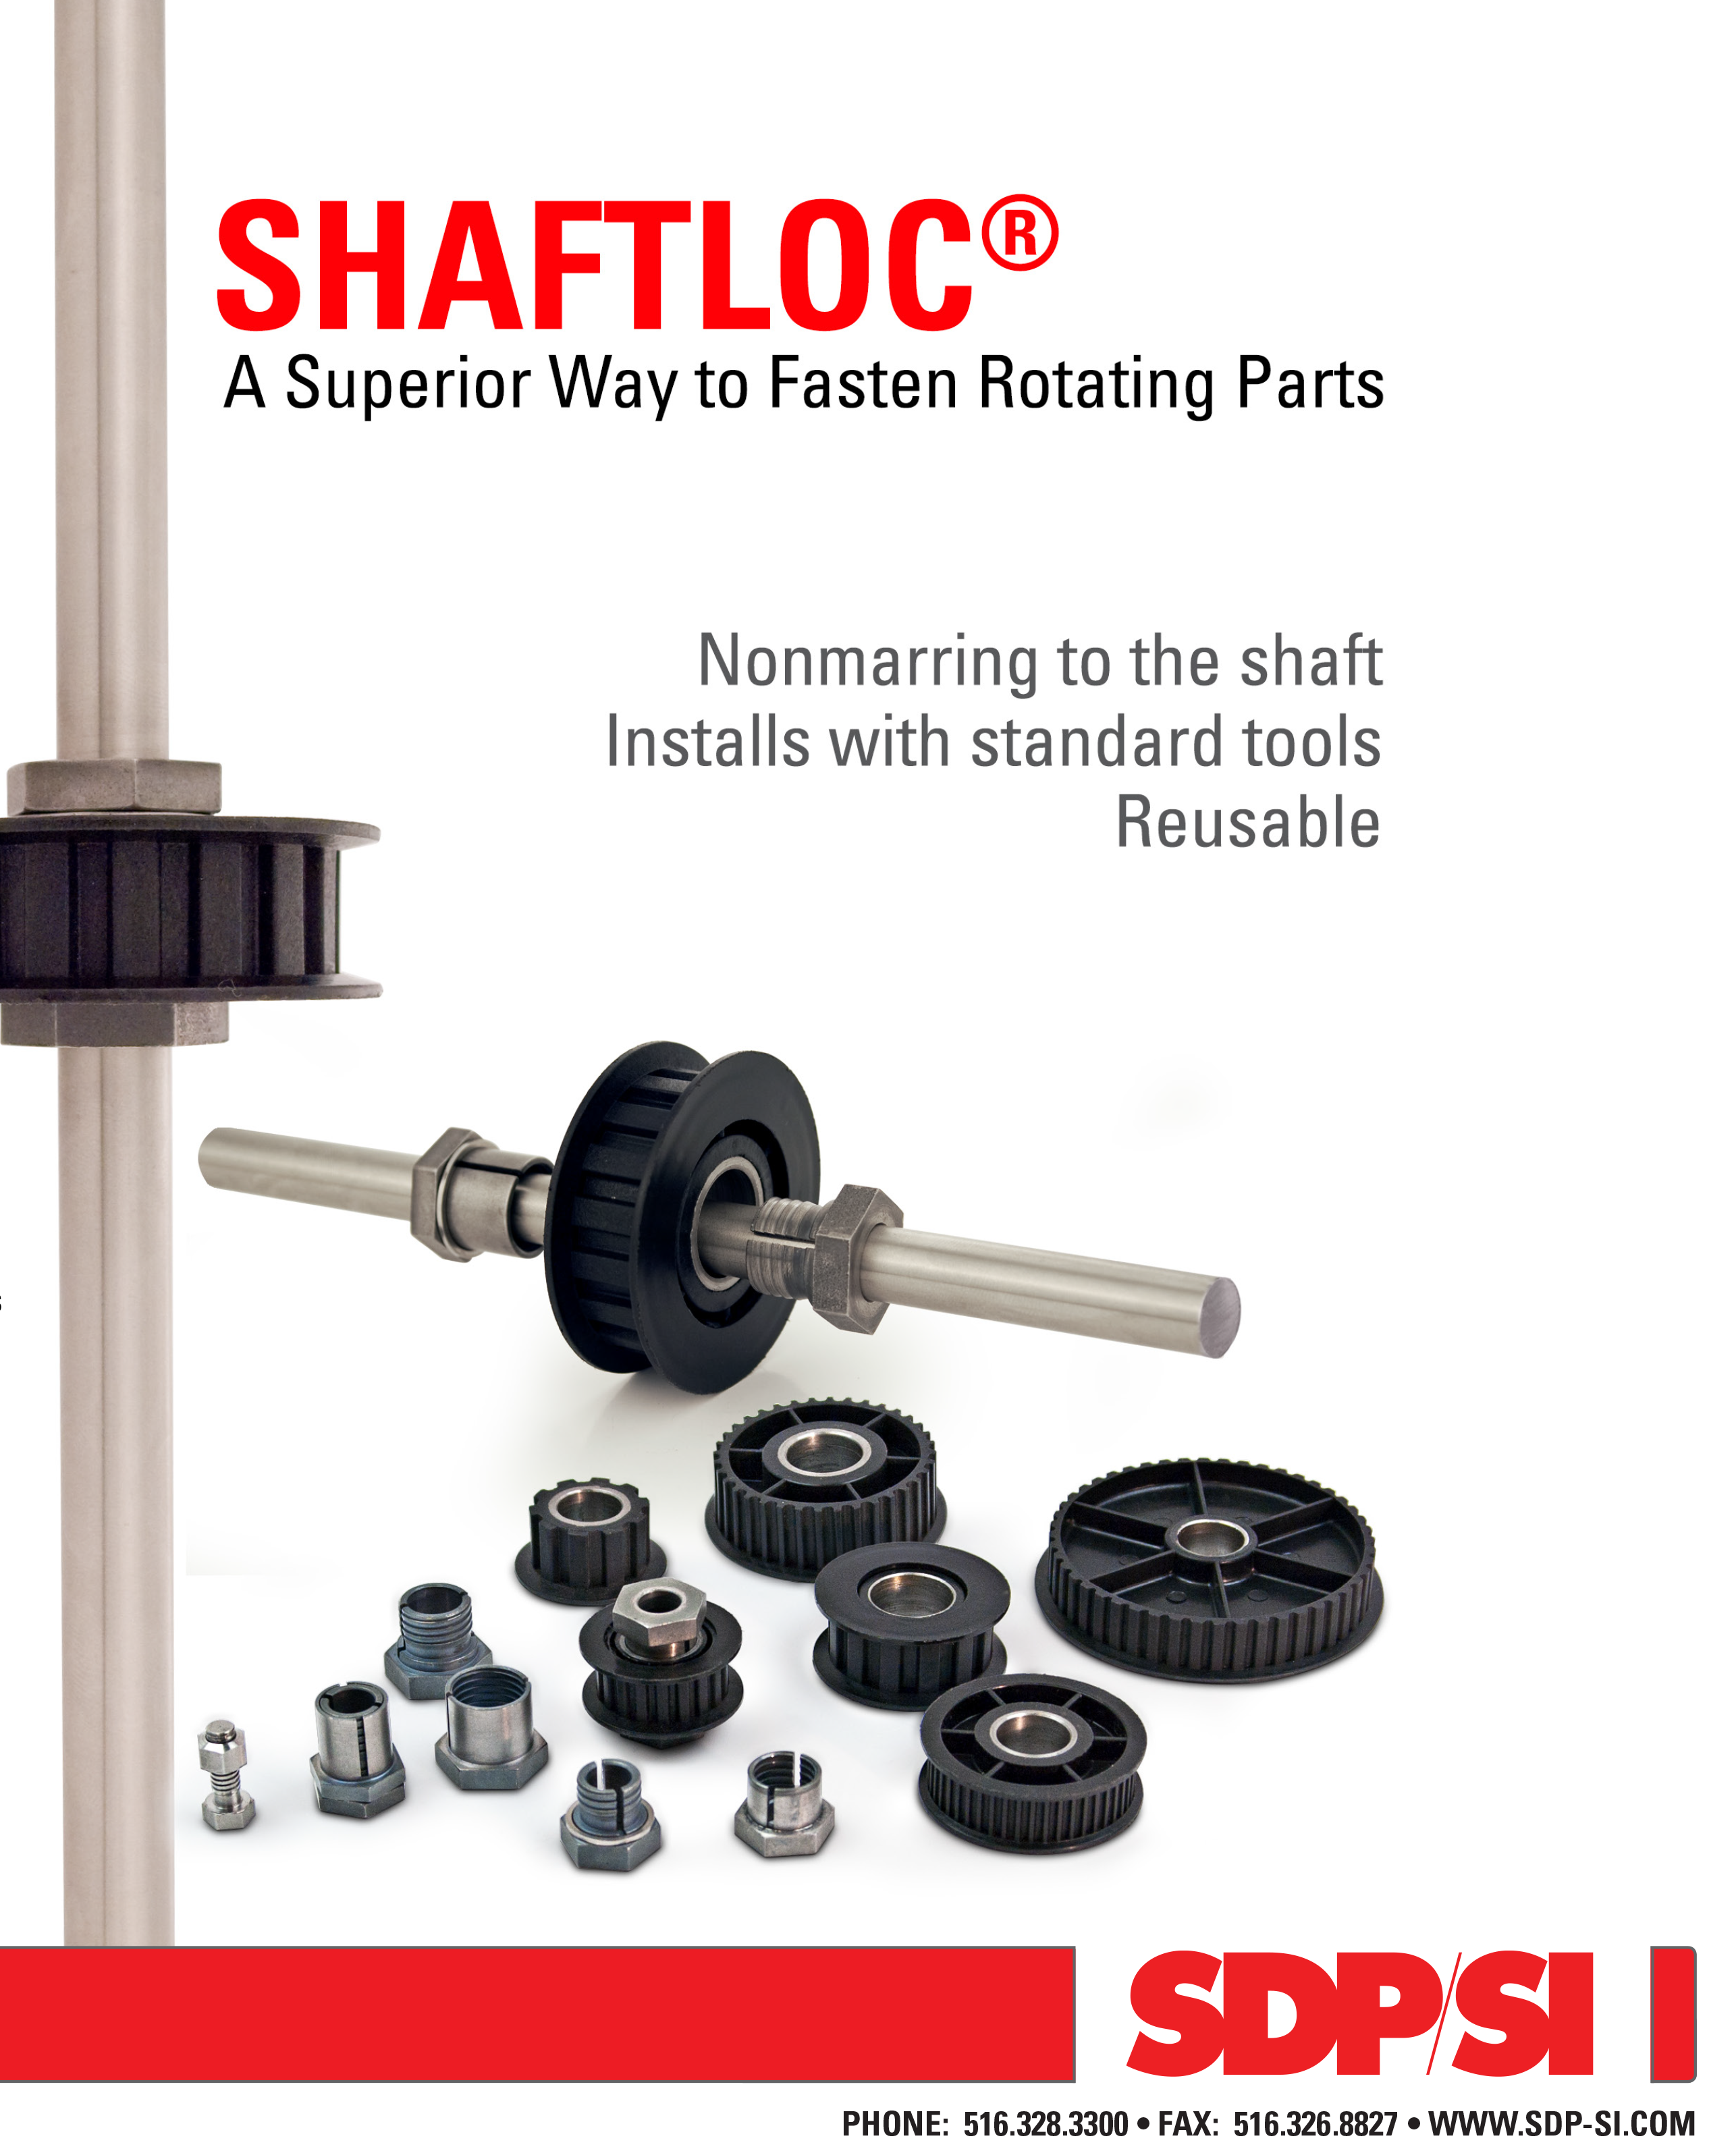 Shaftloc